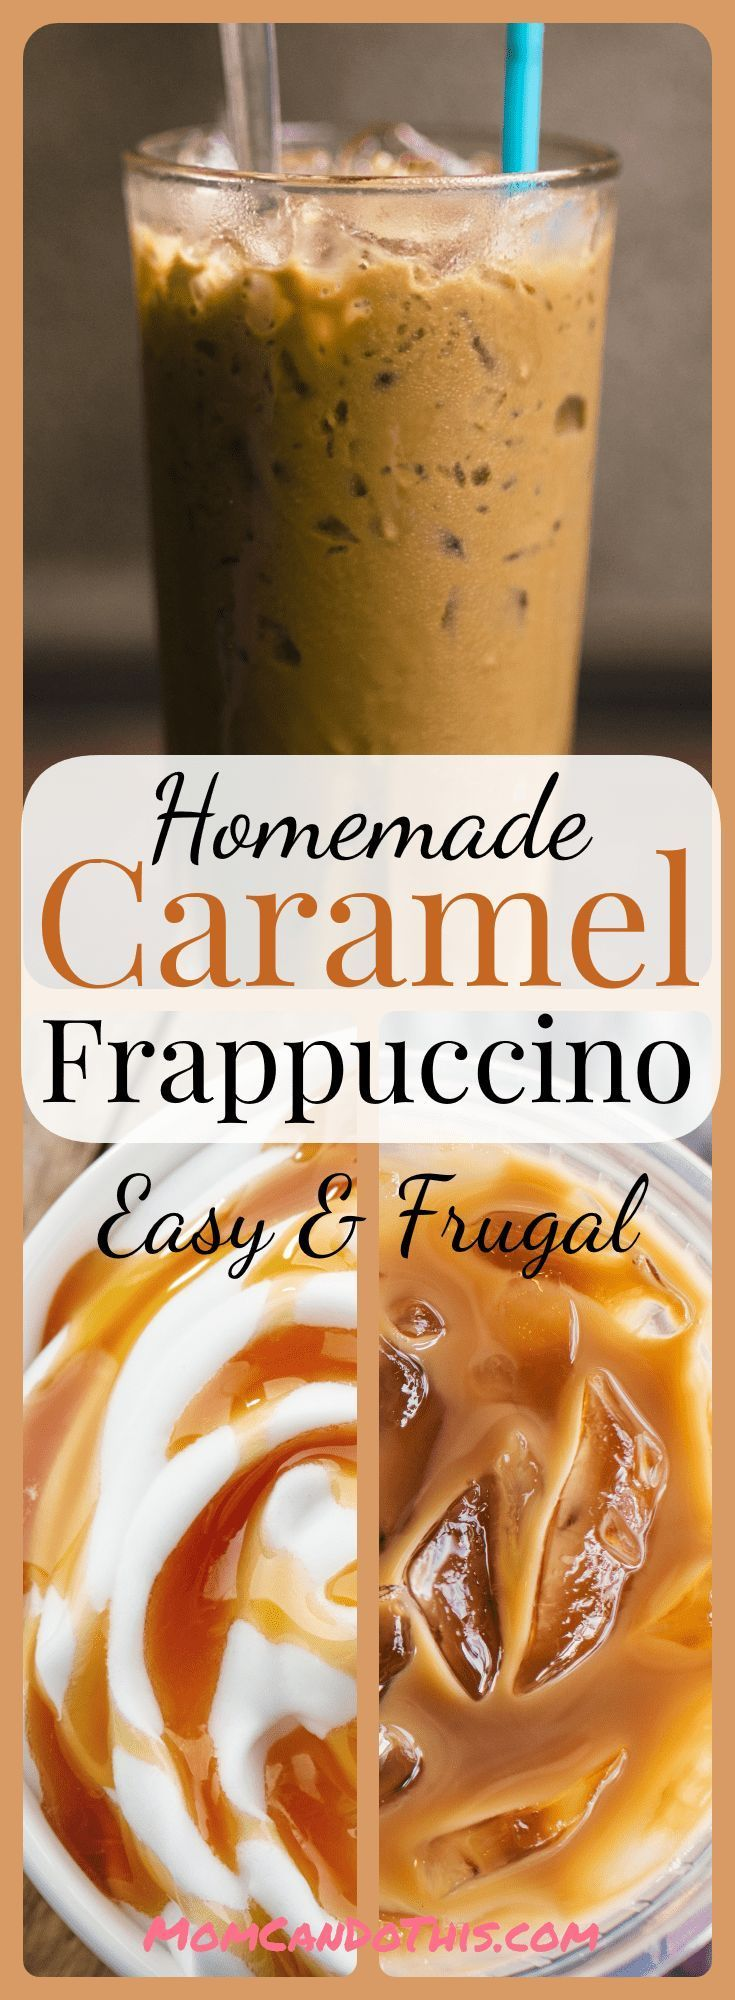 Homemade caramel frappuccino recipe caramel